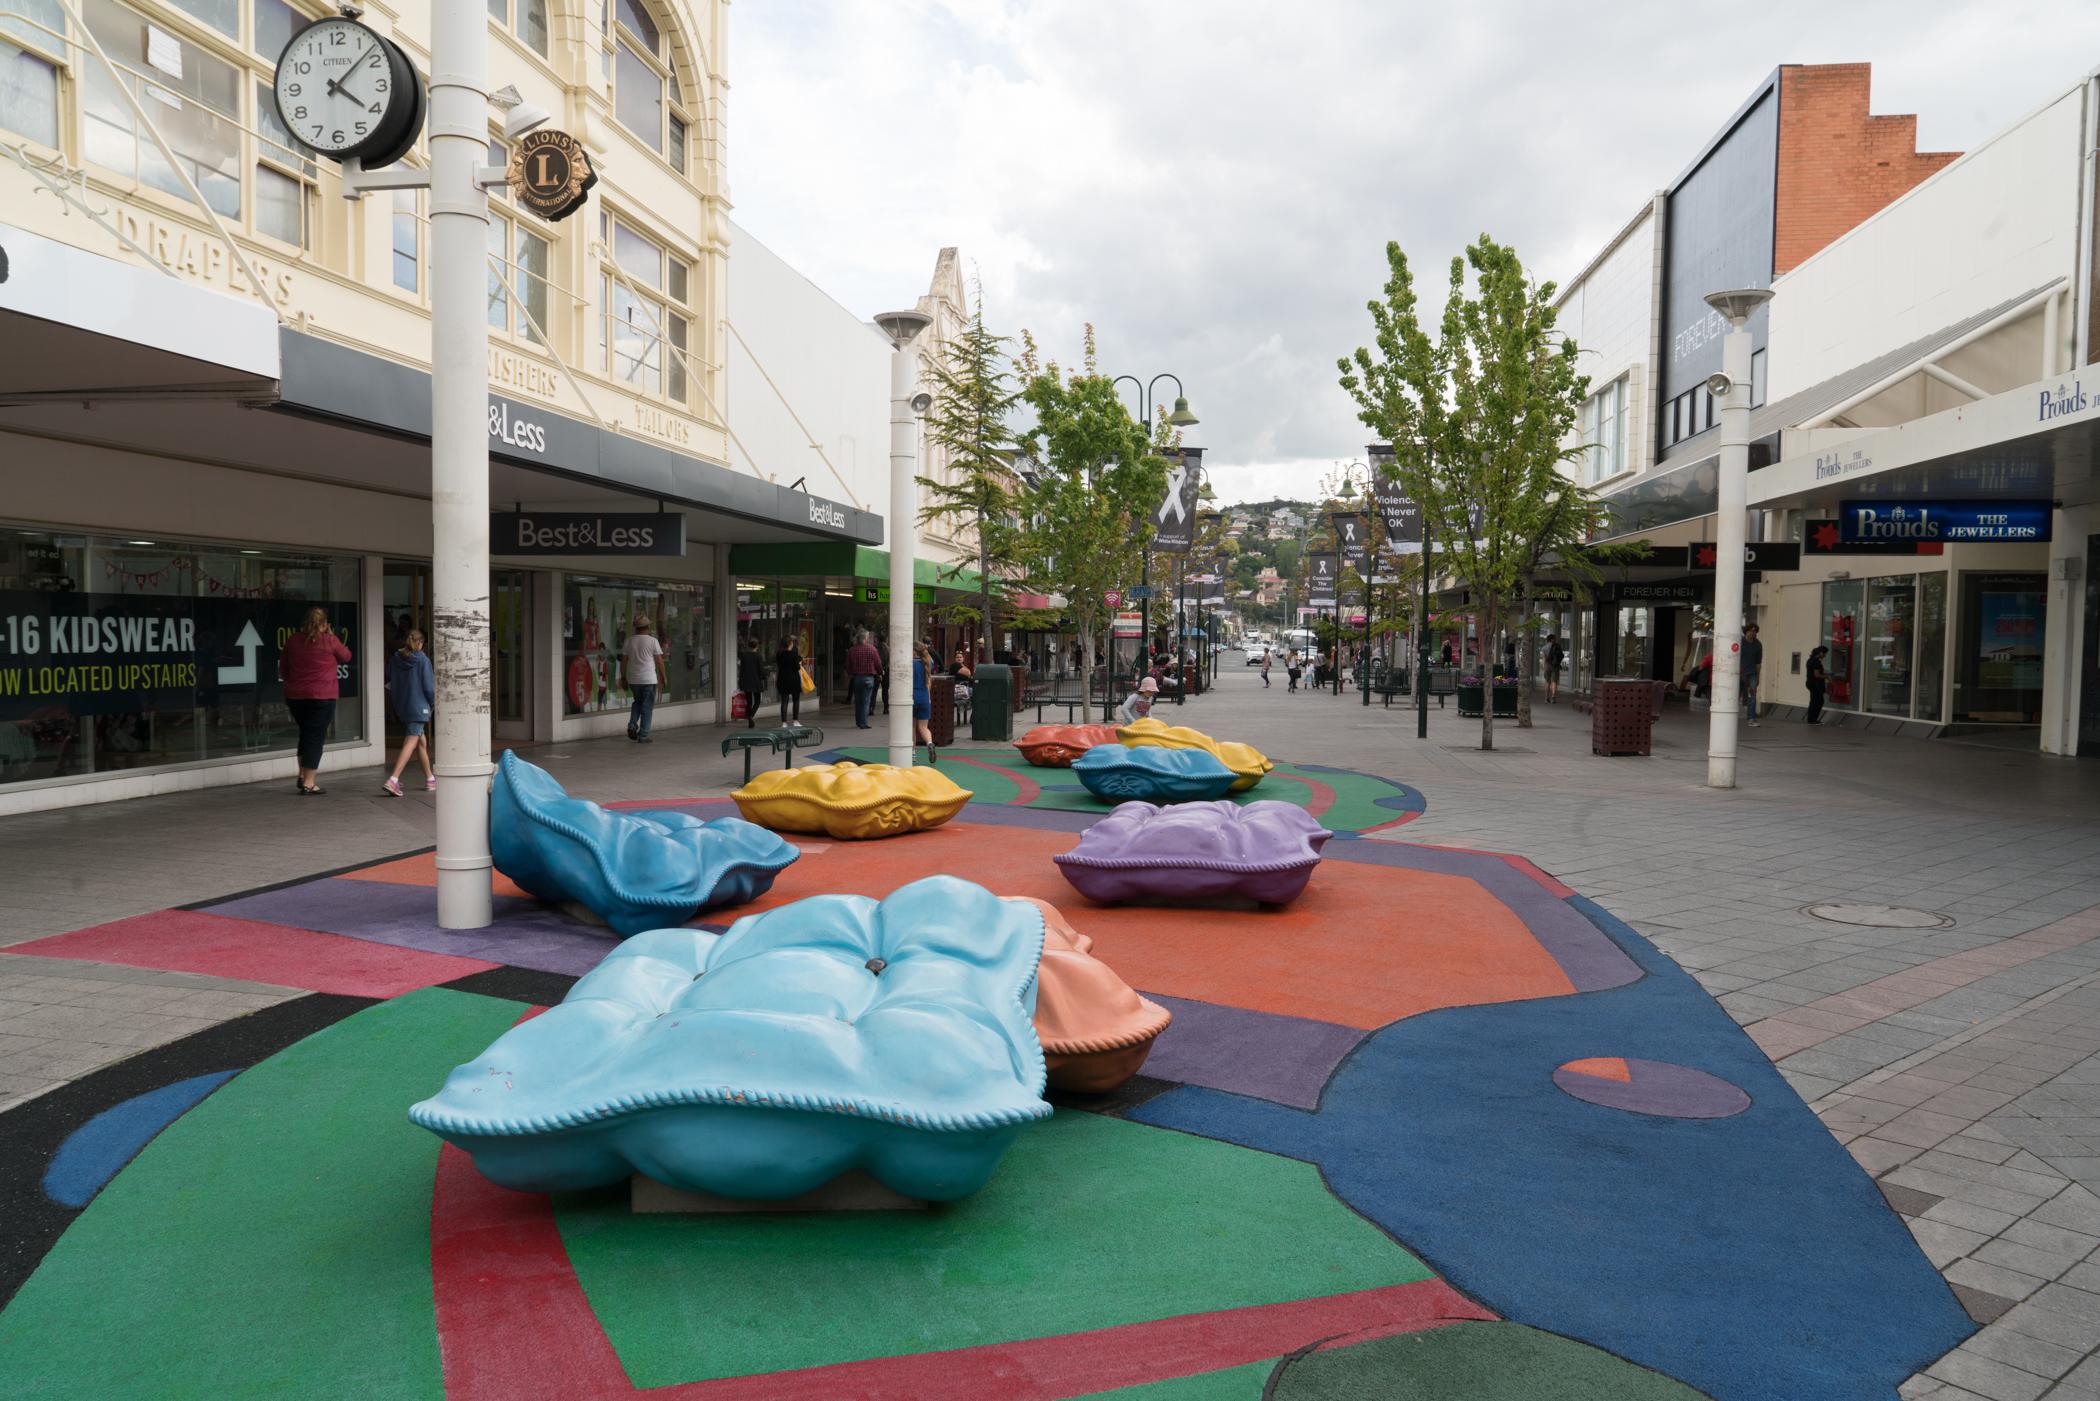 Fig 12: Public art in the Launceston shopping mall